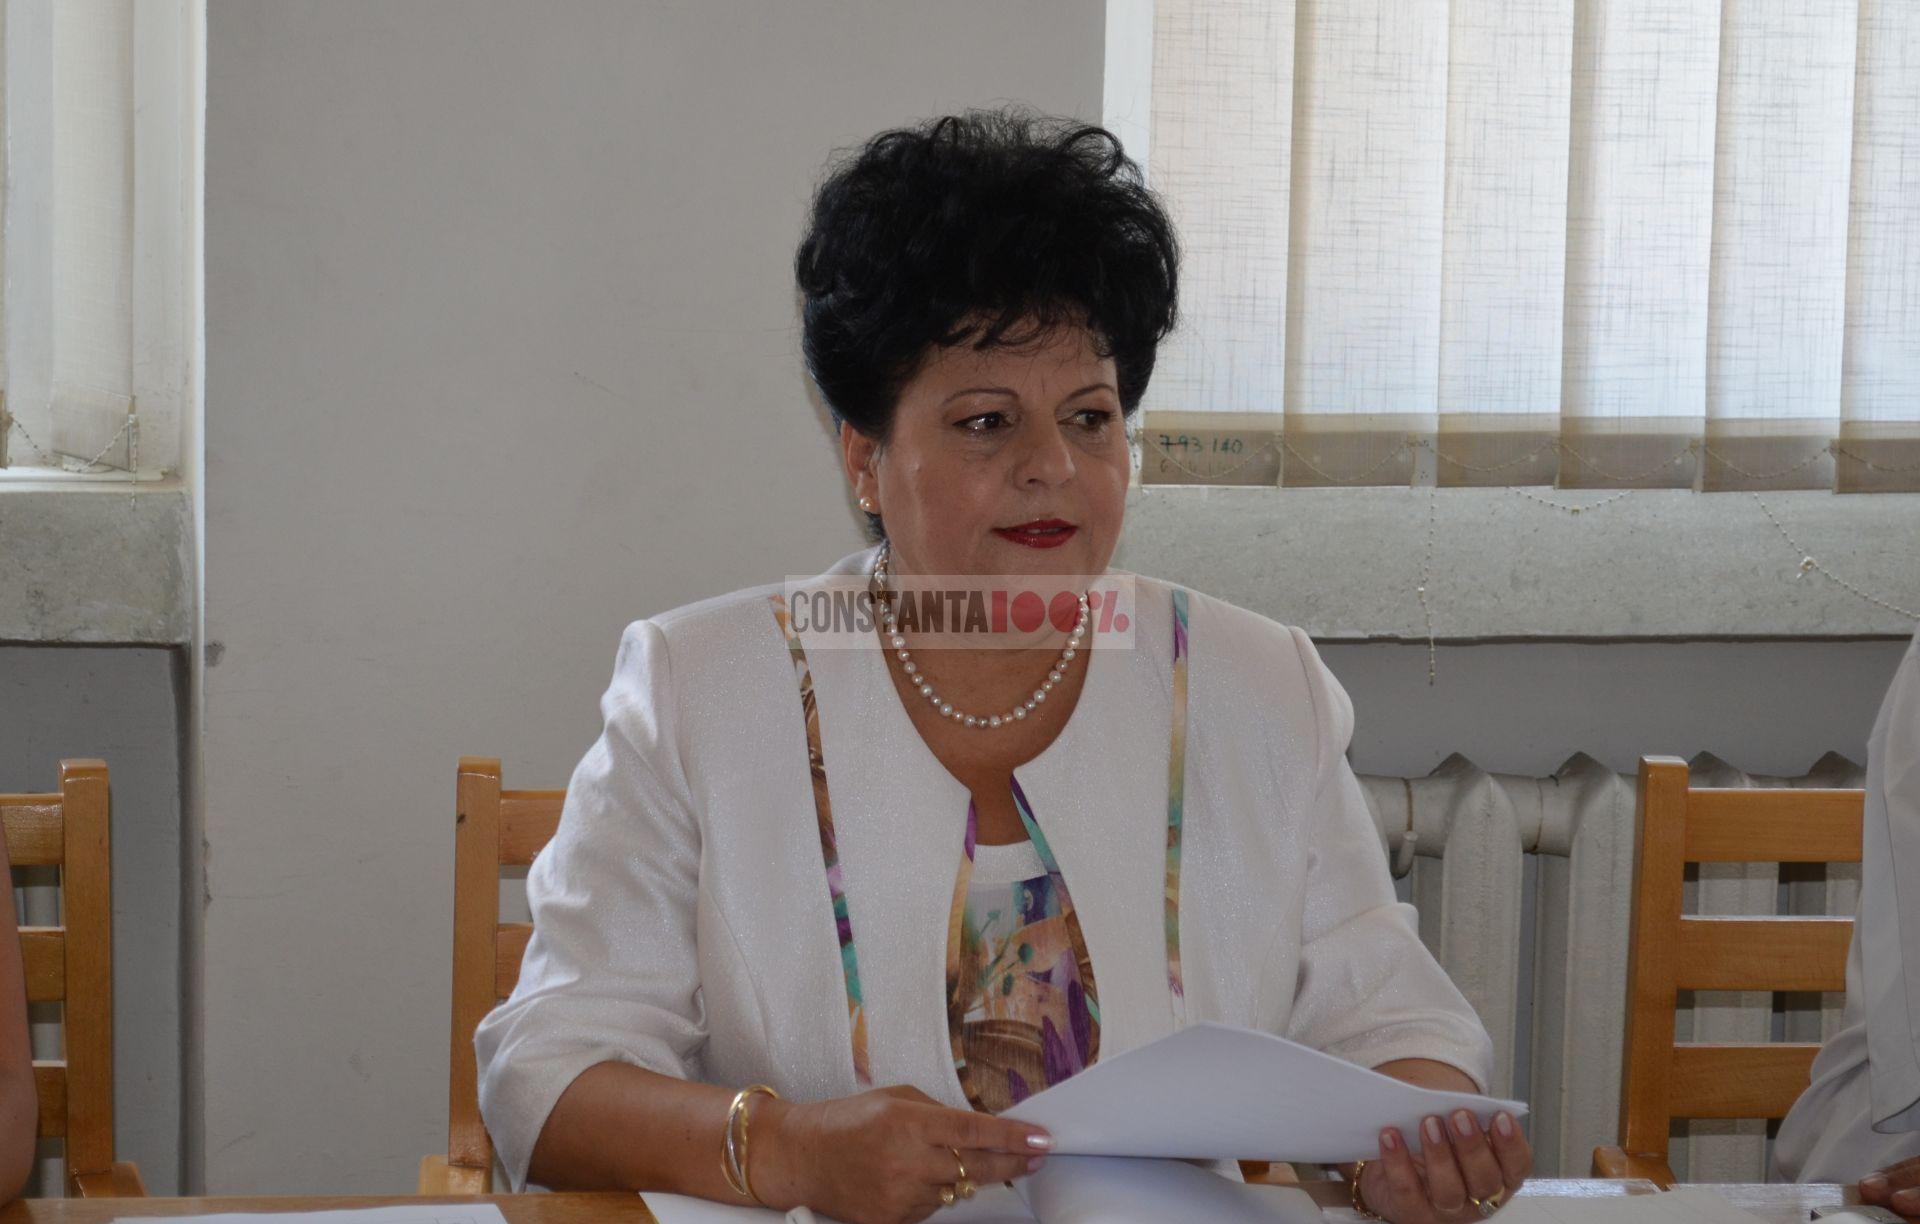 Mariana gaju, cumpana